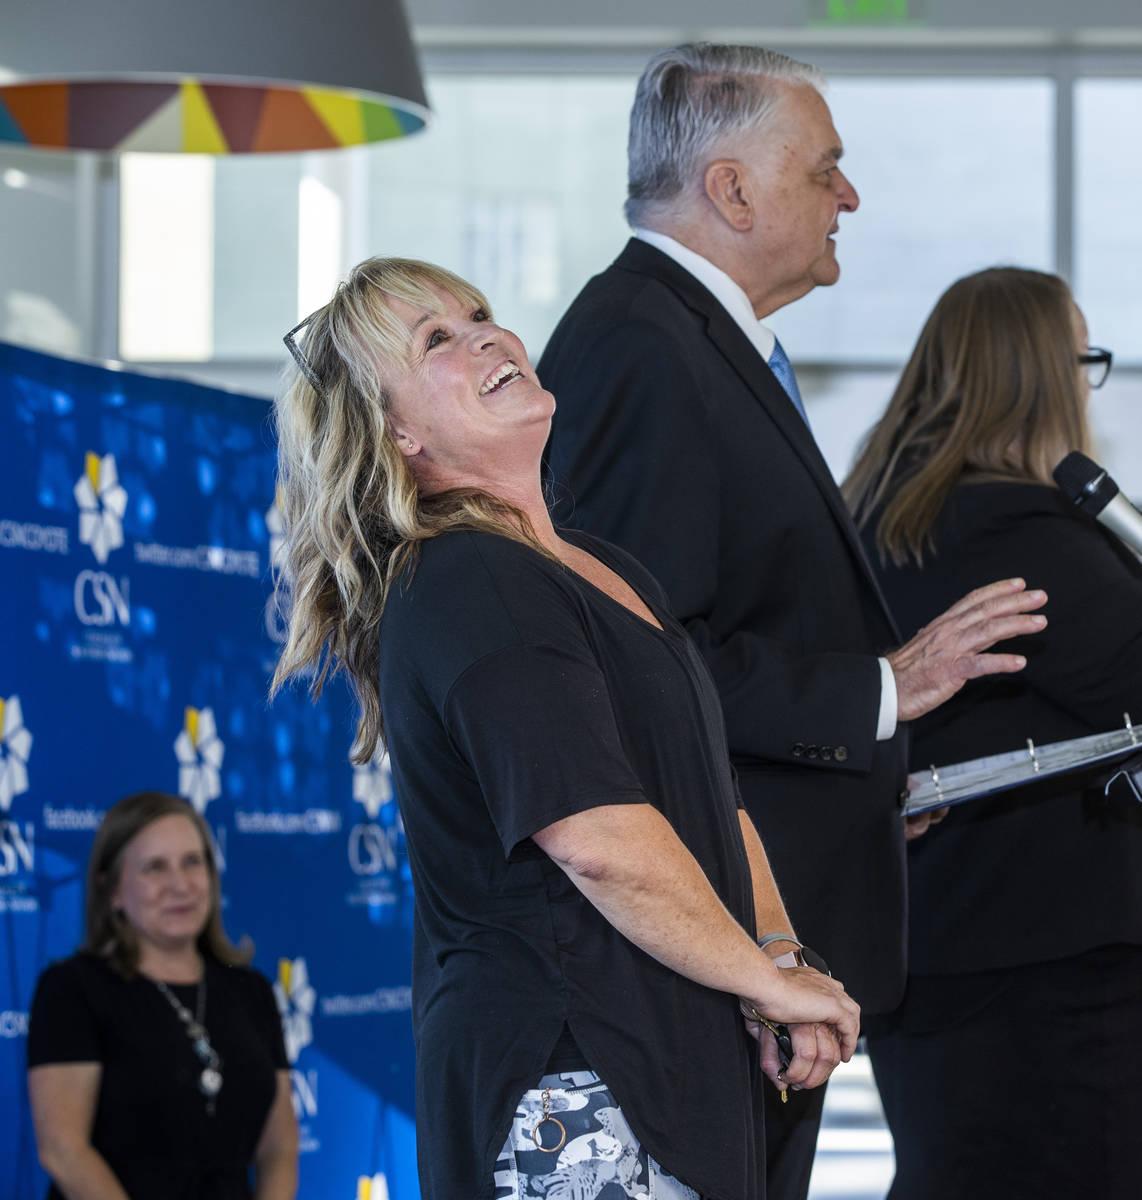 Teacher Elizabeth Allder is surprised after winning $250,000 as Governor Steve Sisolak and Immu ...